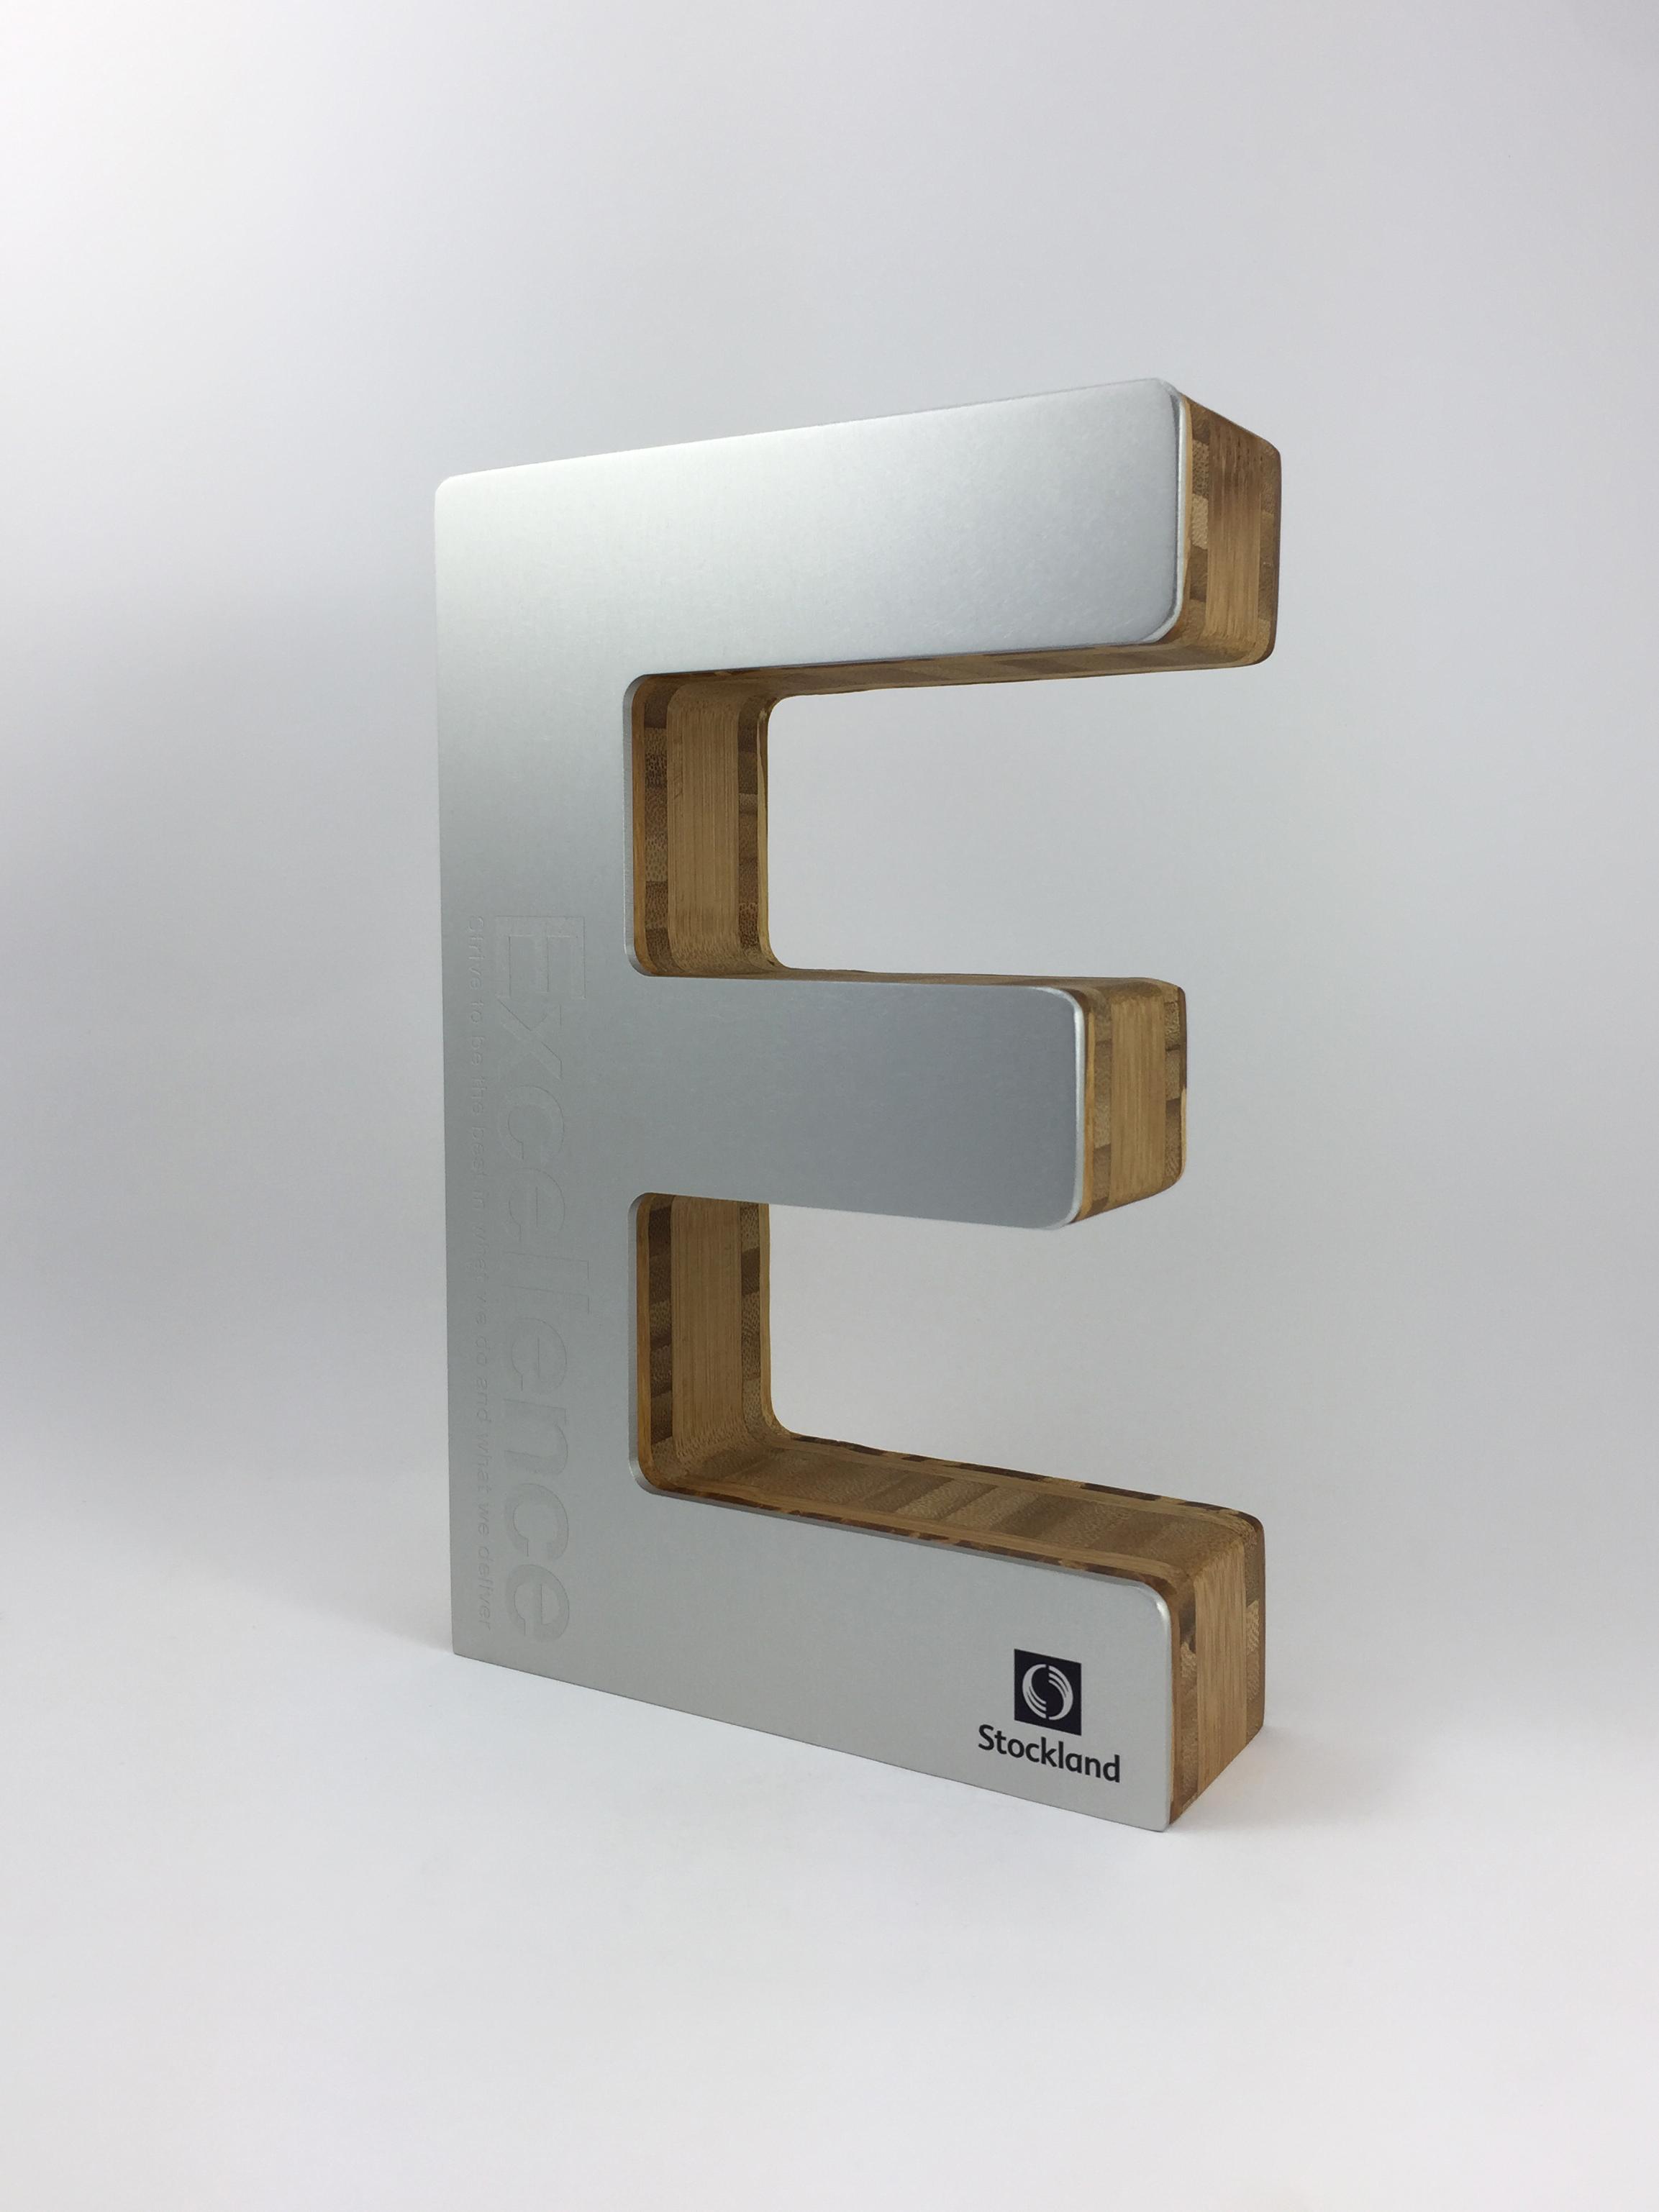 stockland-care-awards-eco-bamboo-plywood-timber-aluminium-trophy-05.jpg